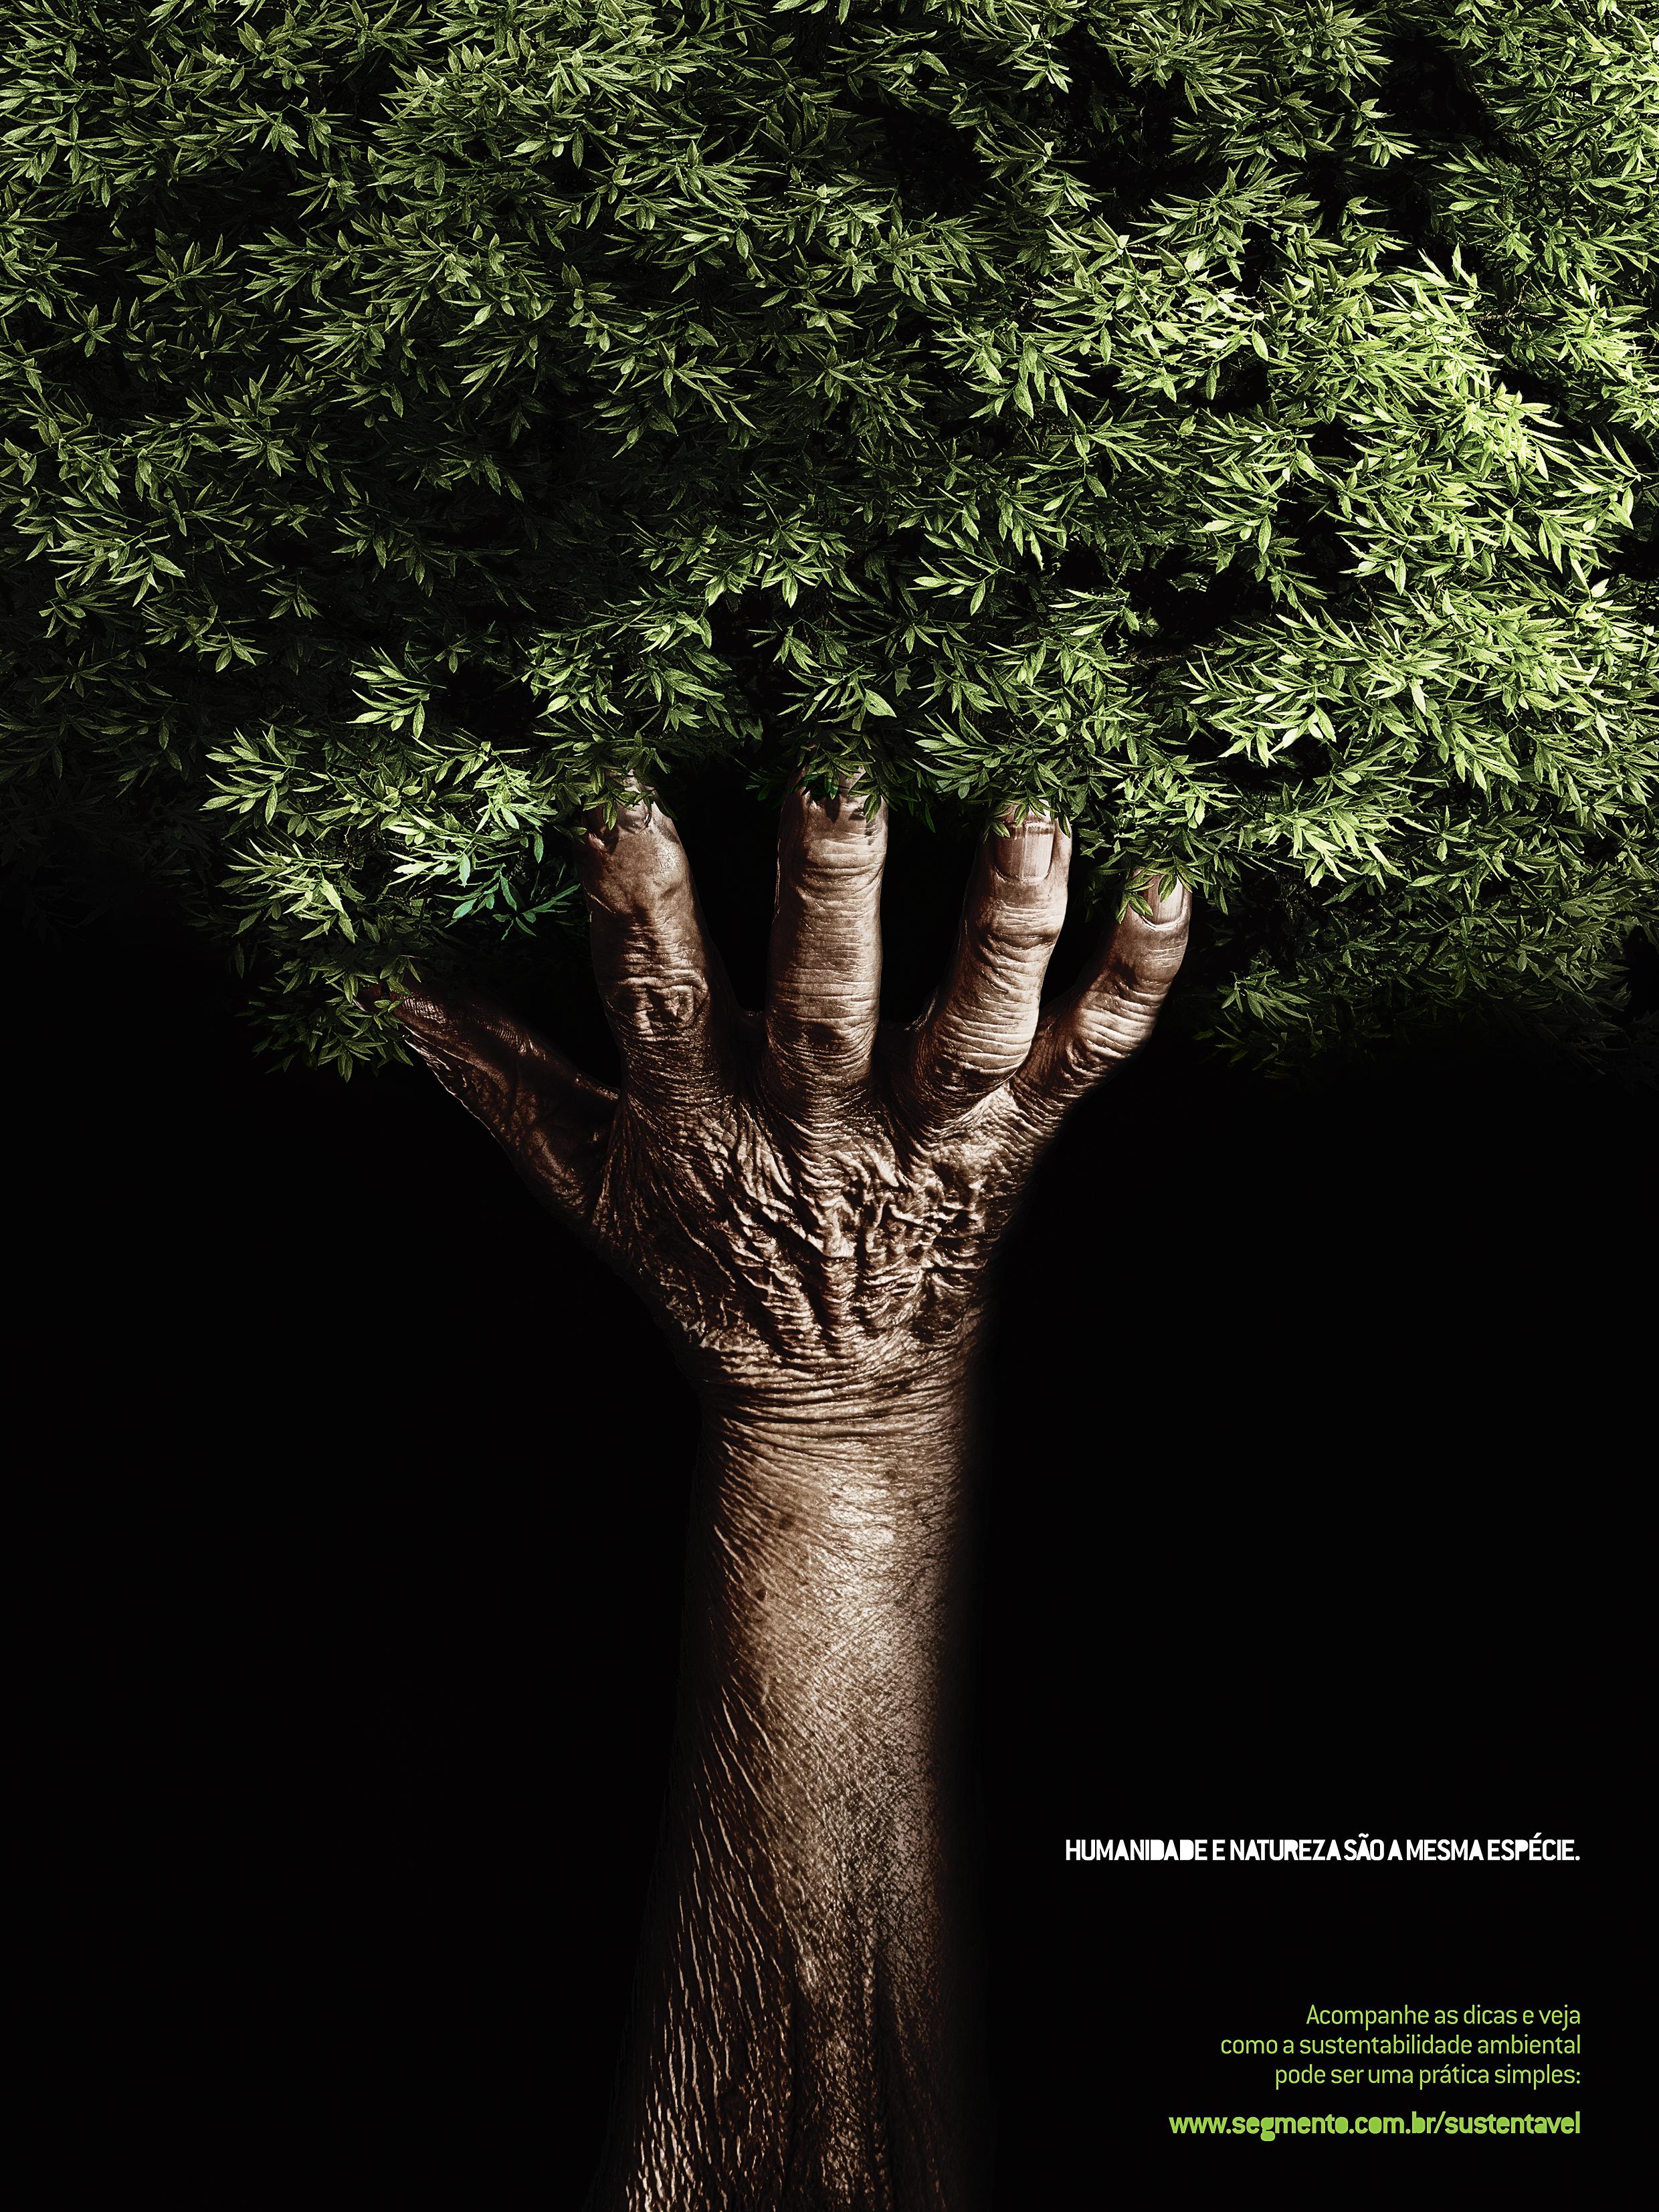 Segmento Sustentável